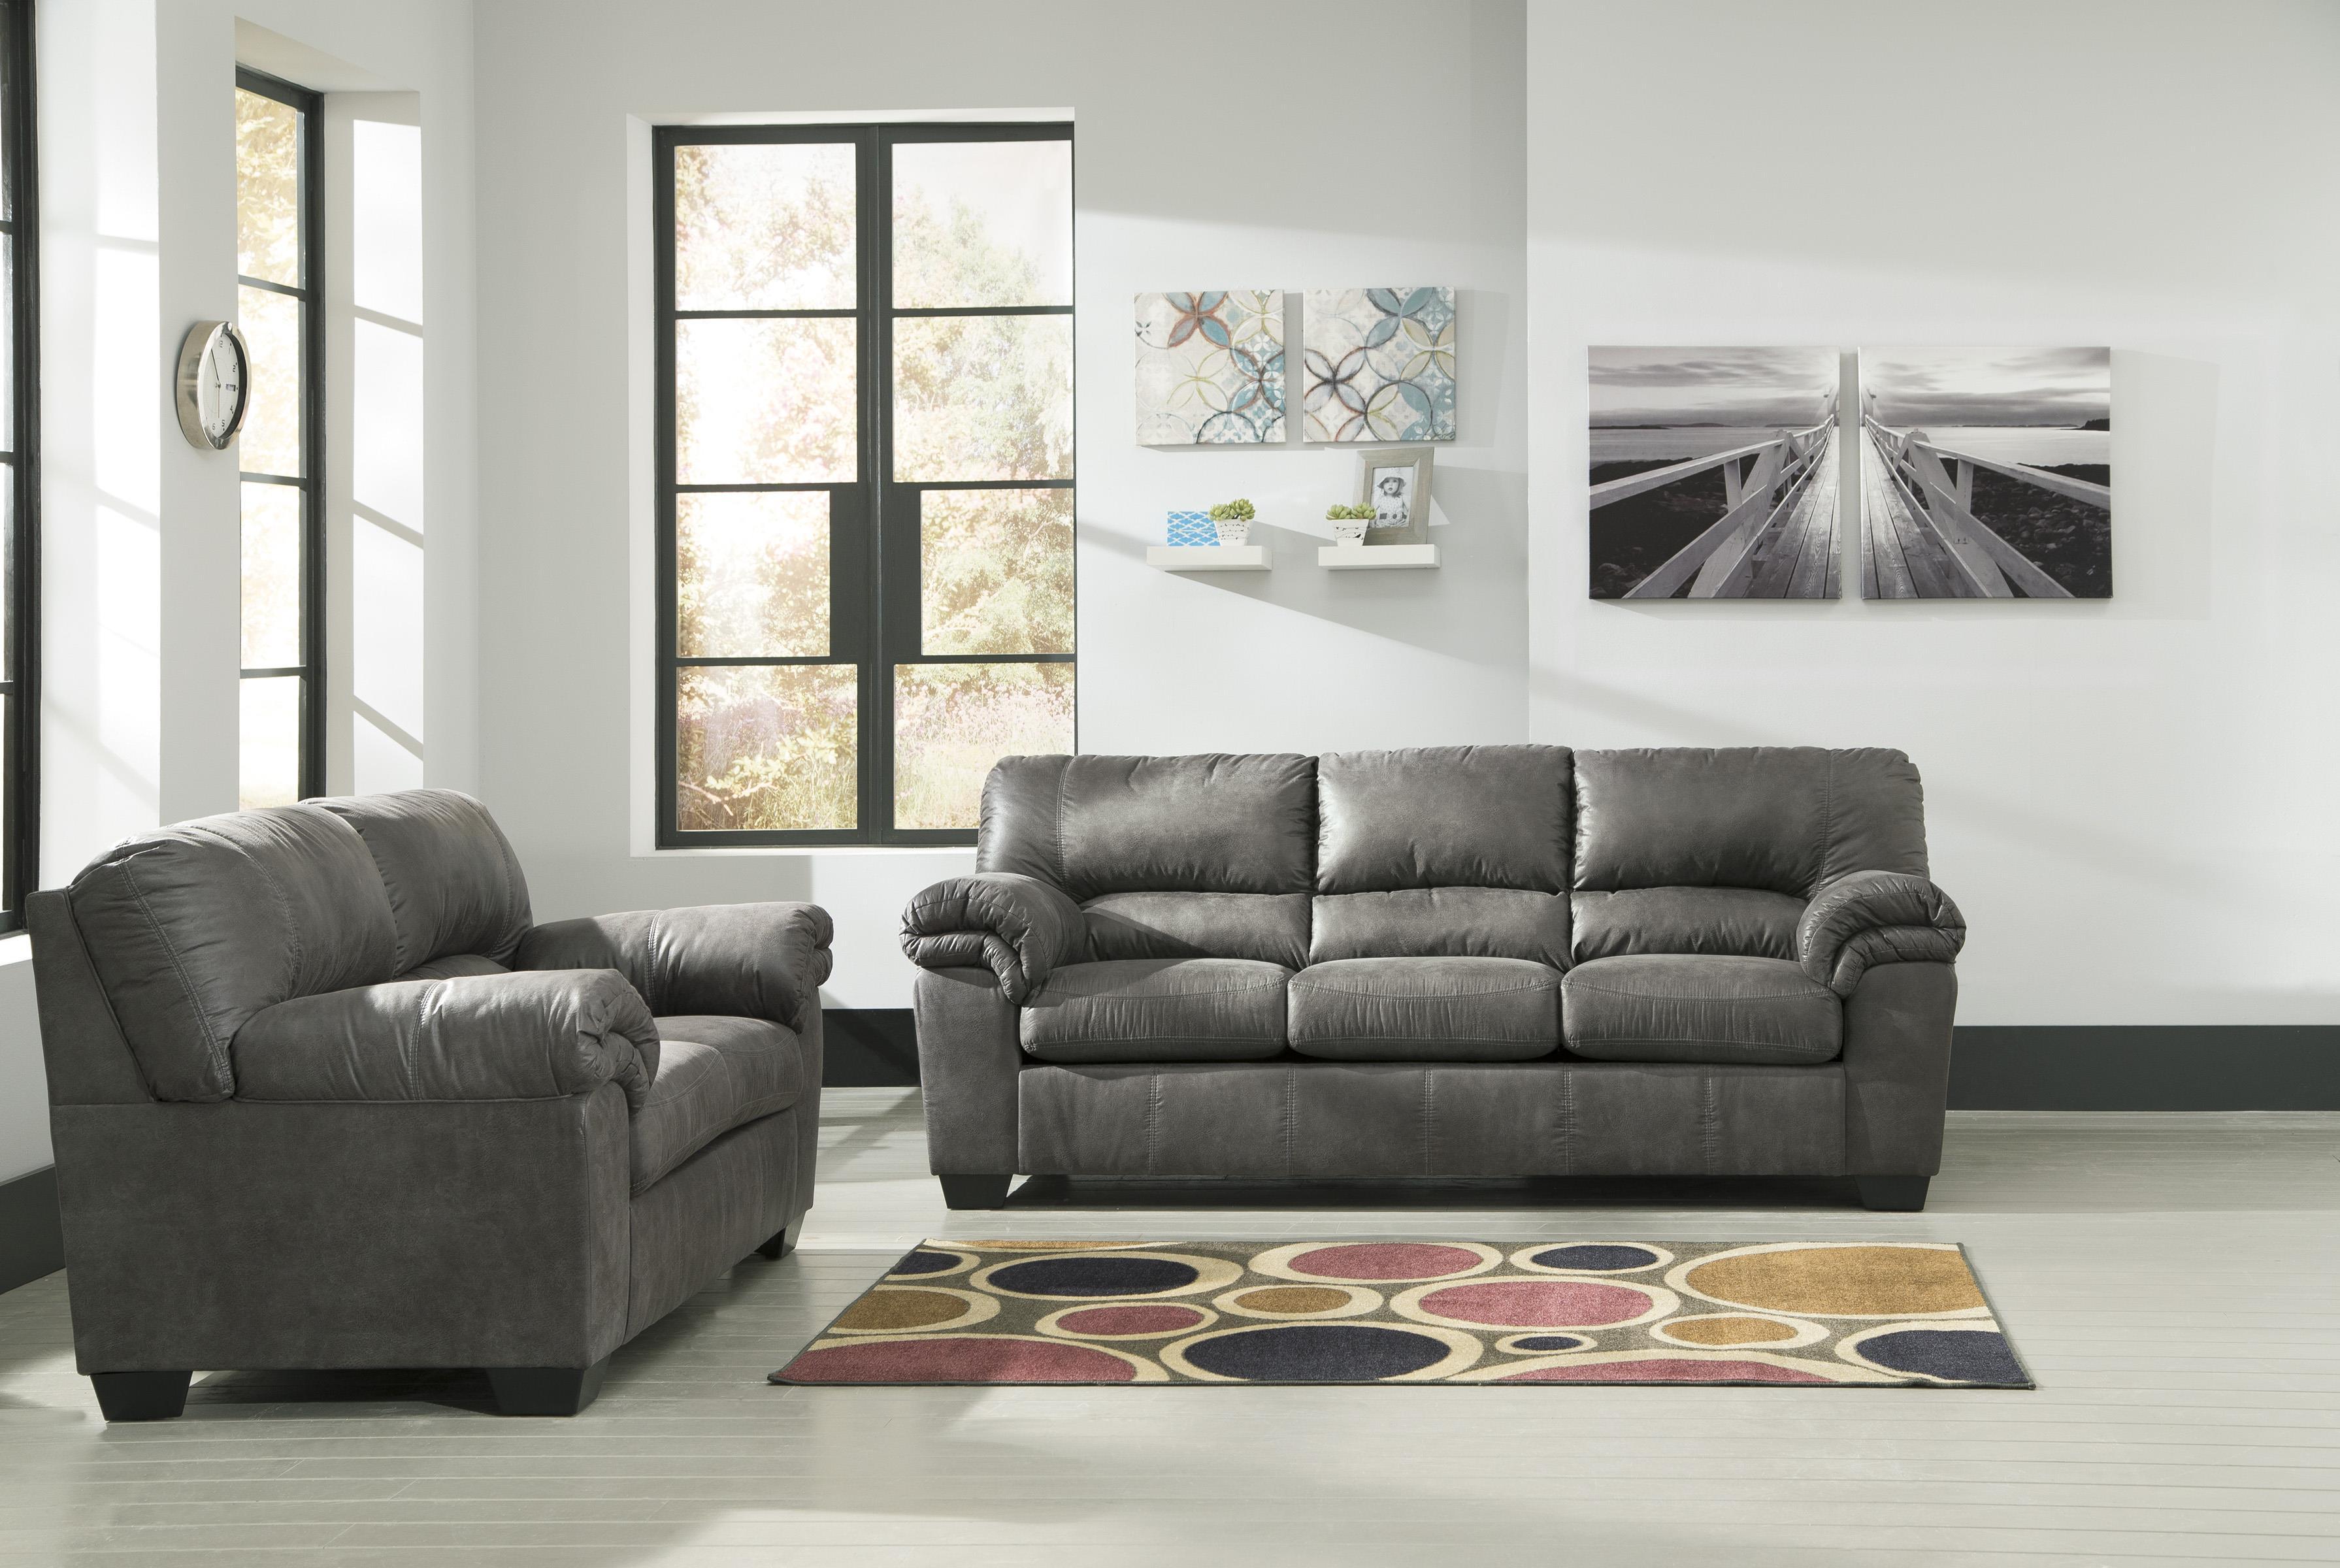 Signature design by ashley bladen stationary living room for Ashley furniture appleton